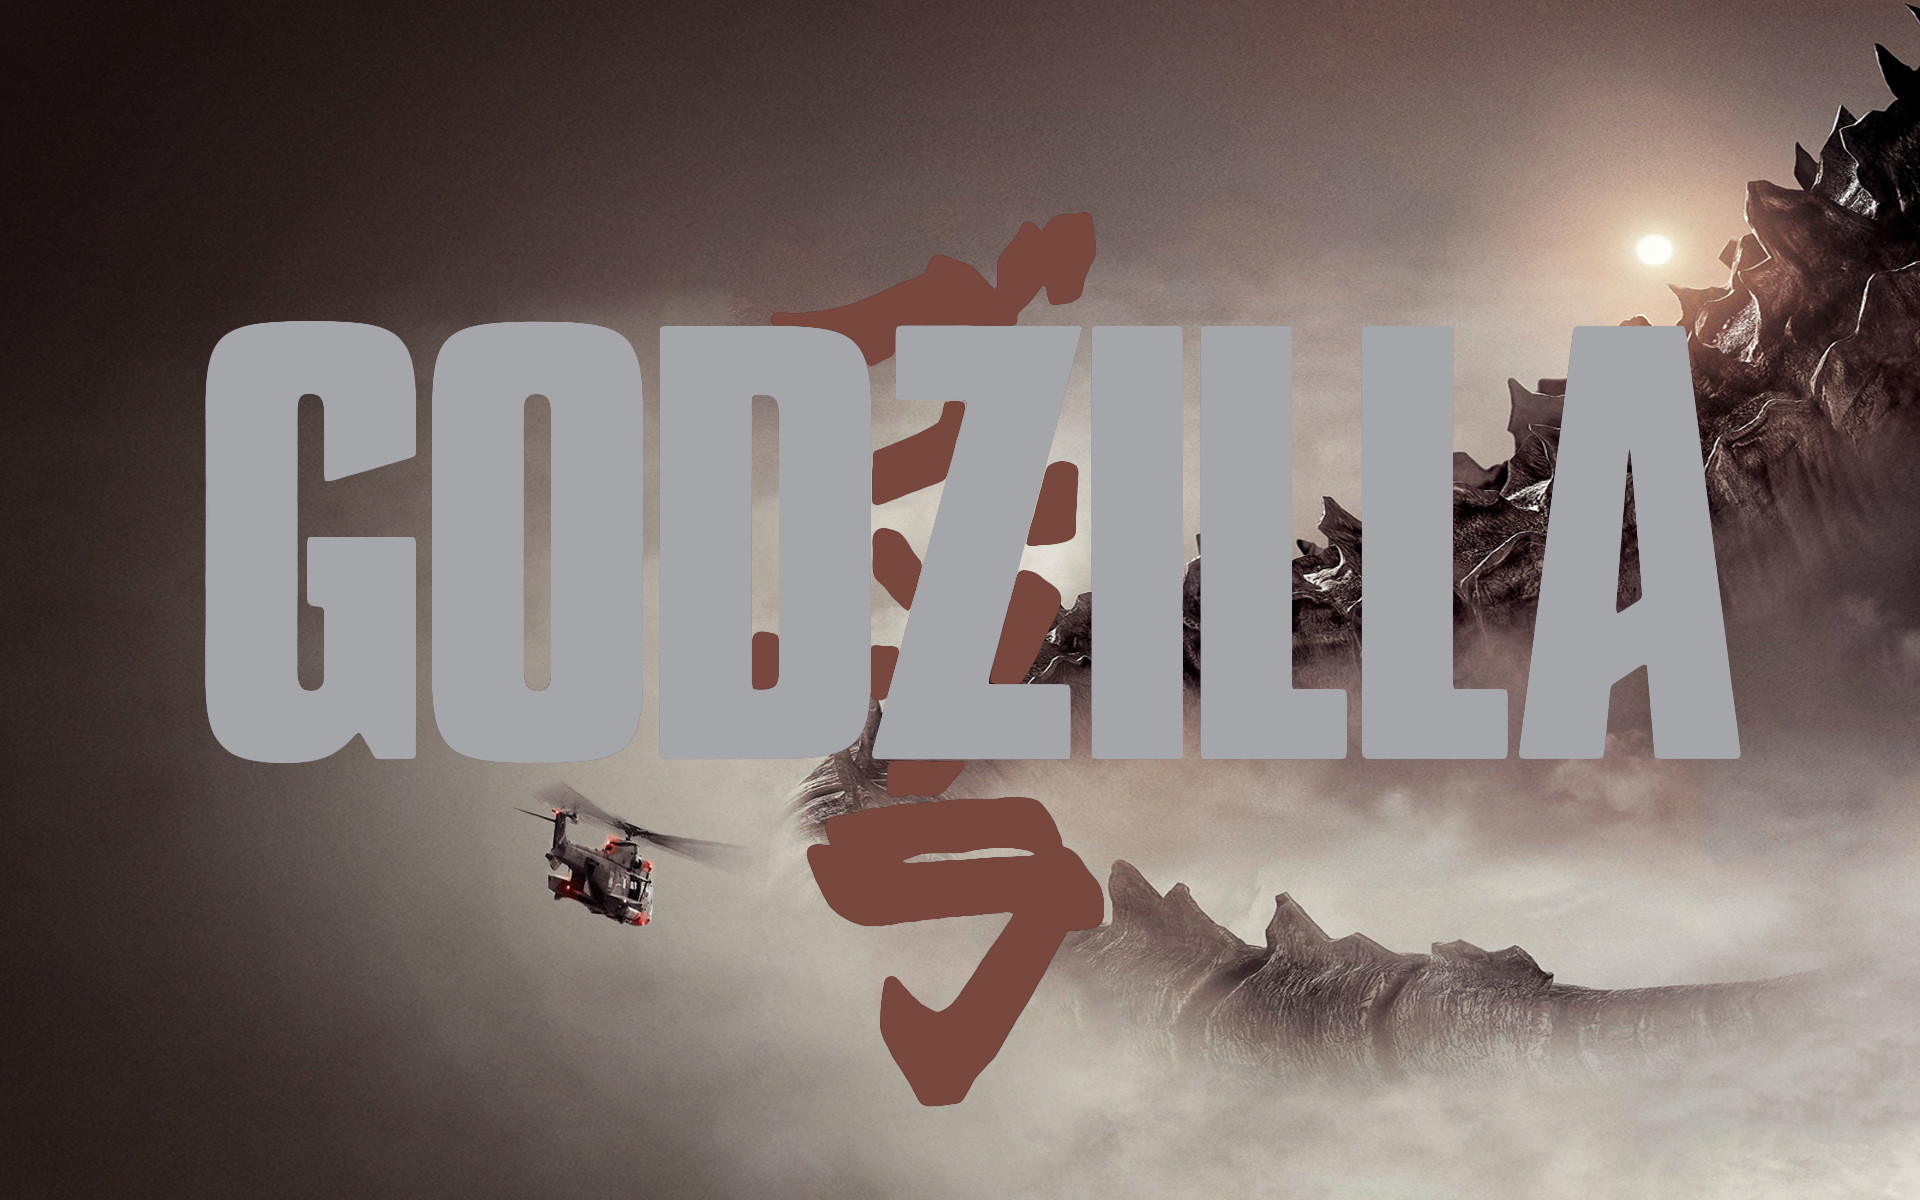 Fall Halloween Desktop Wallpaper Godzilla Wallpapers Hd Pixelstalk Net